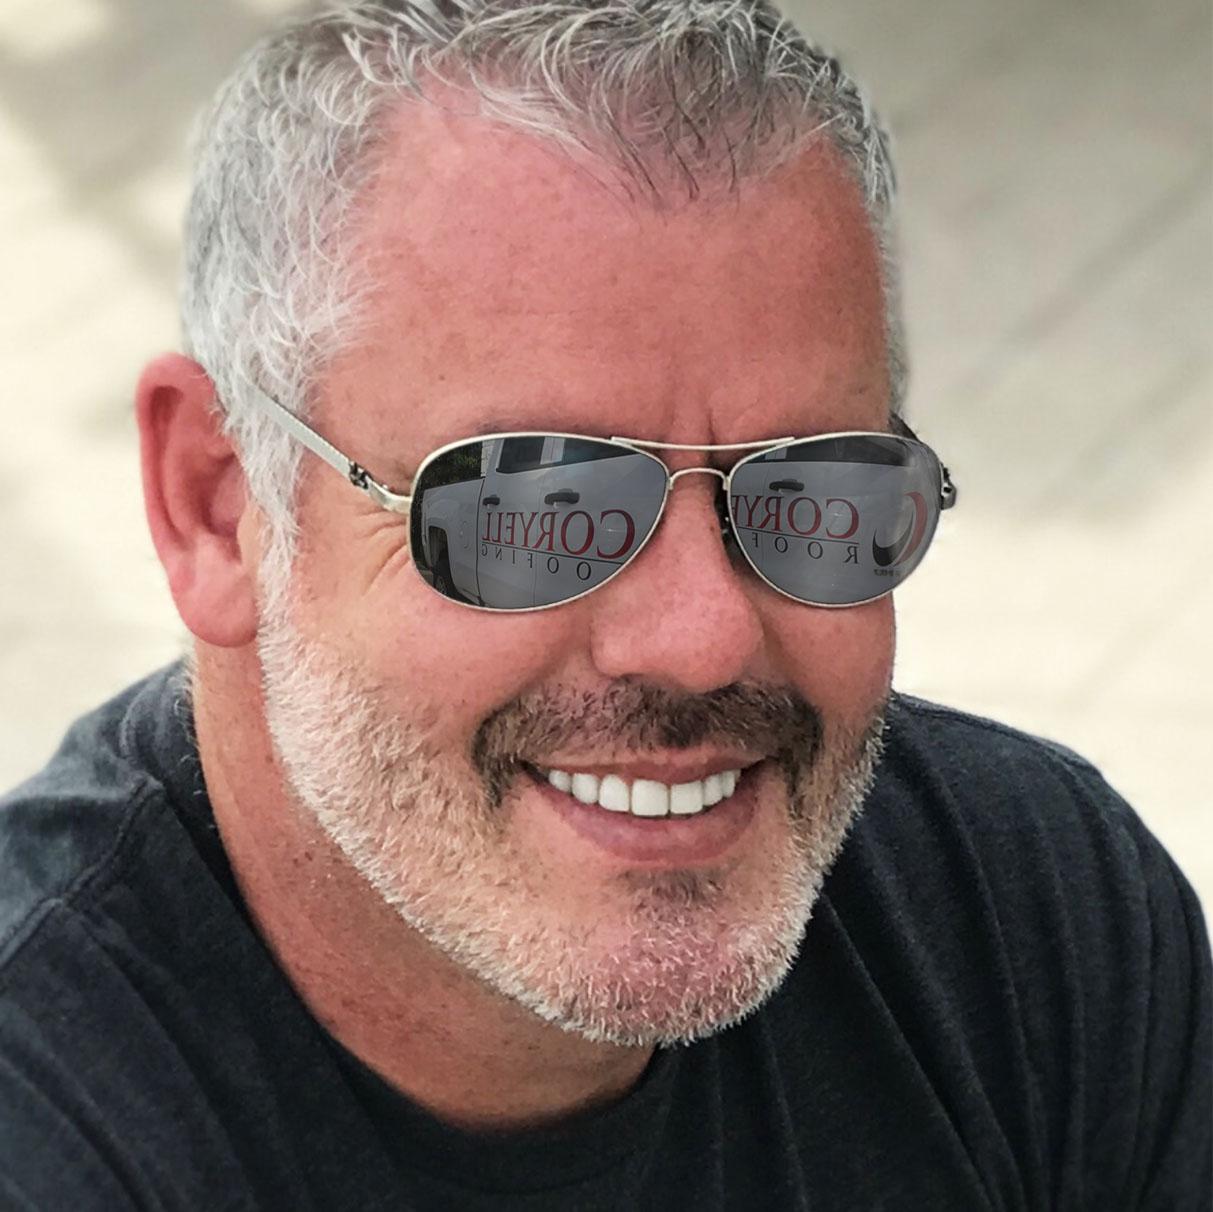 Chris Coryell